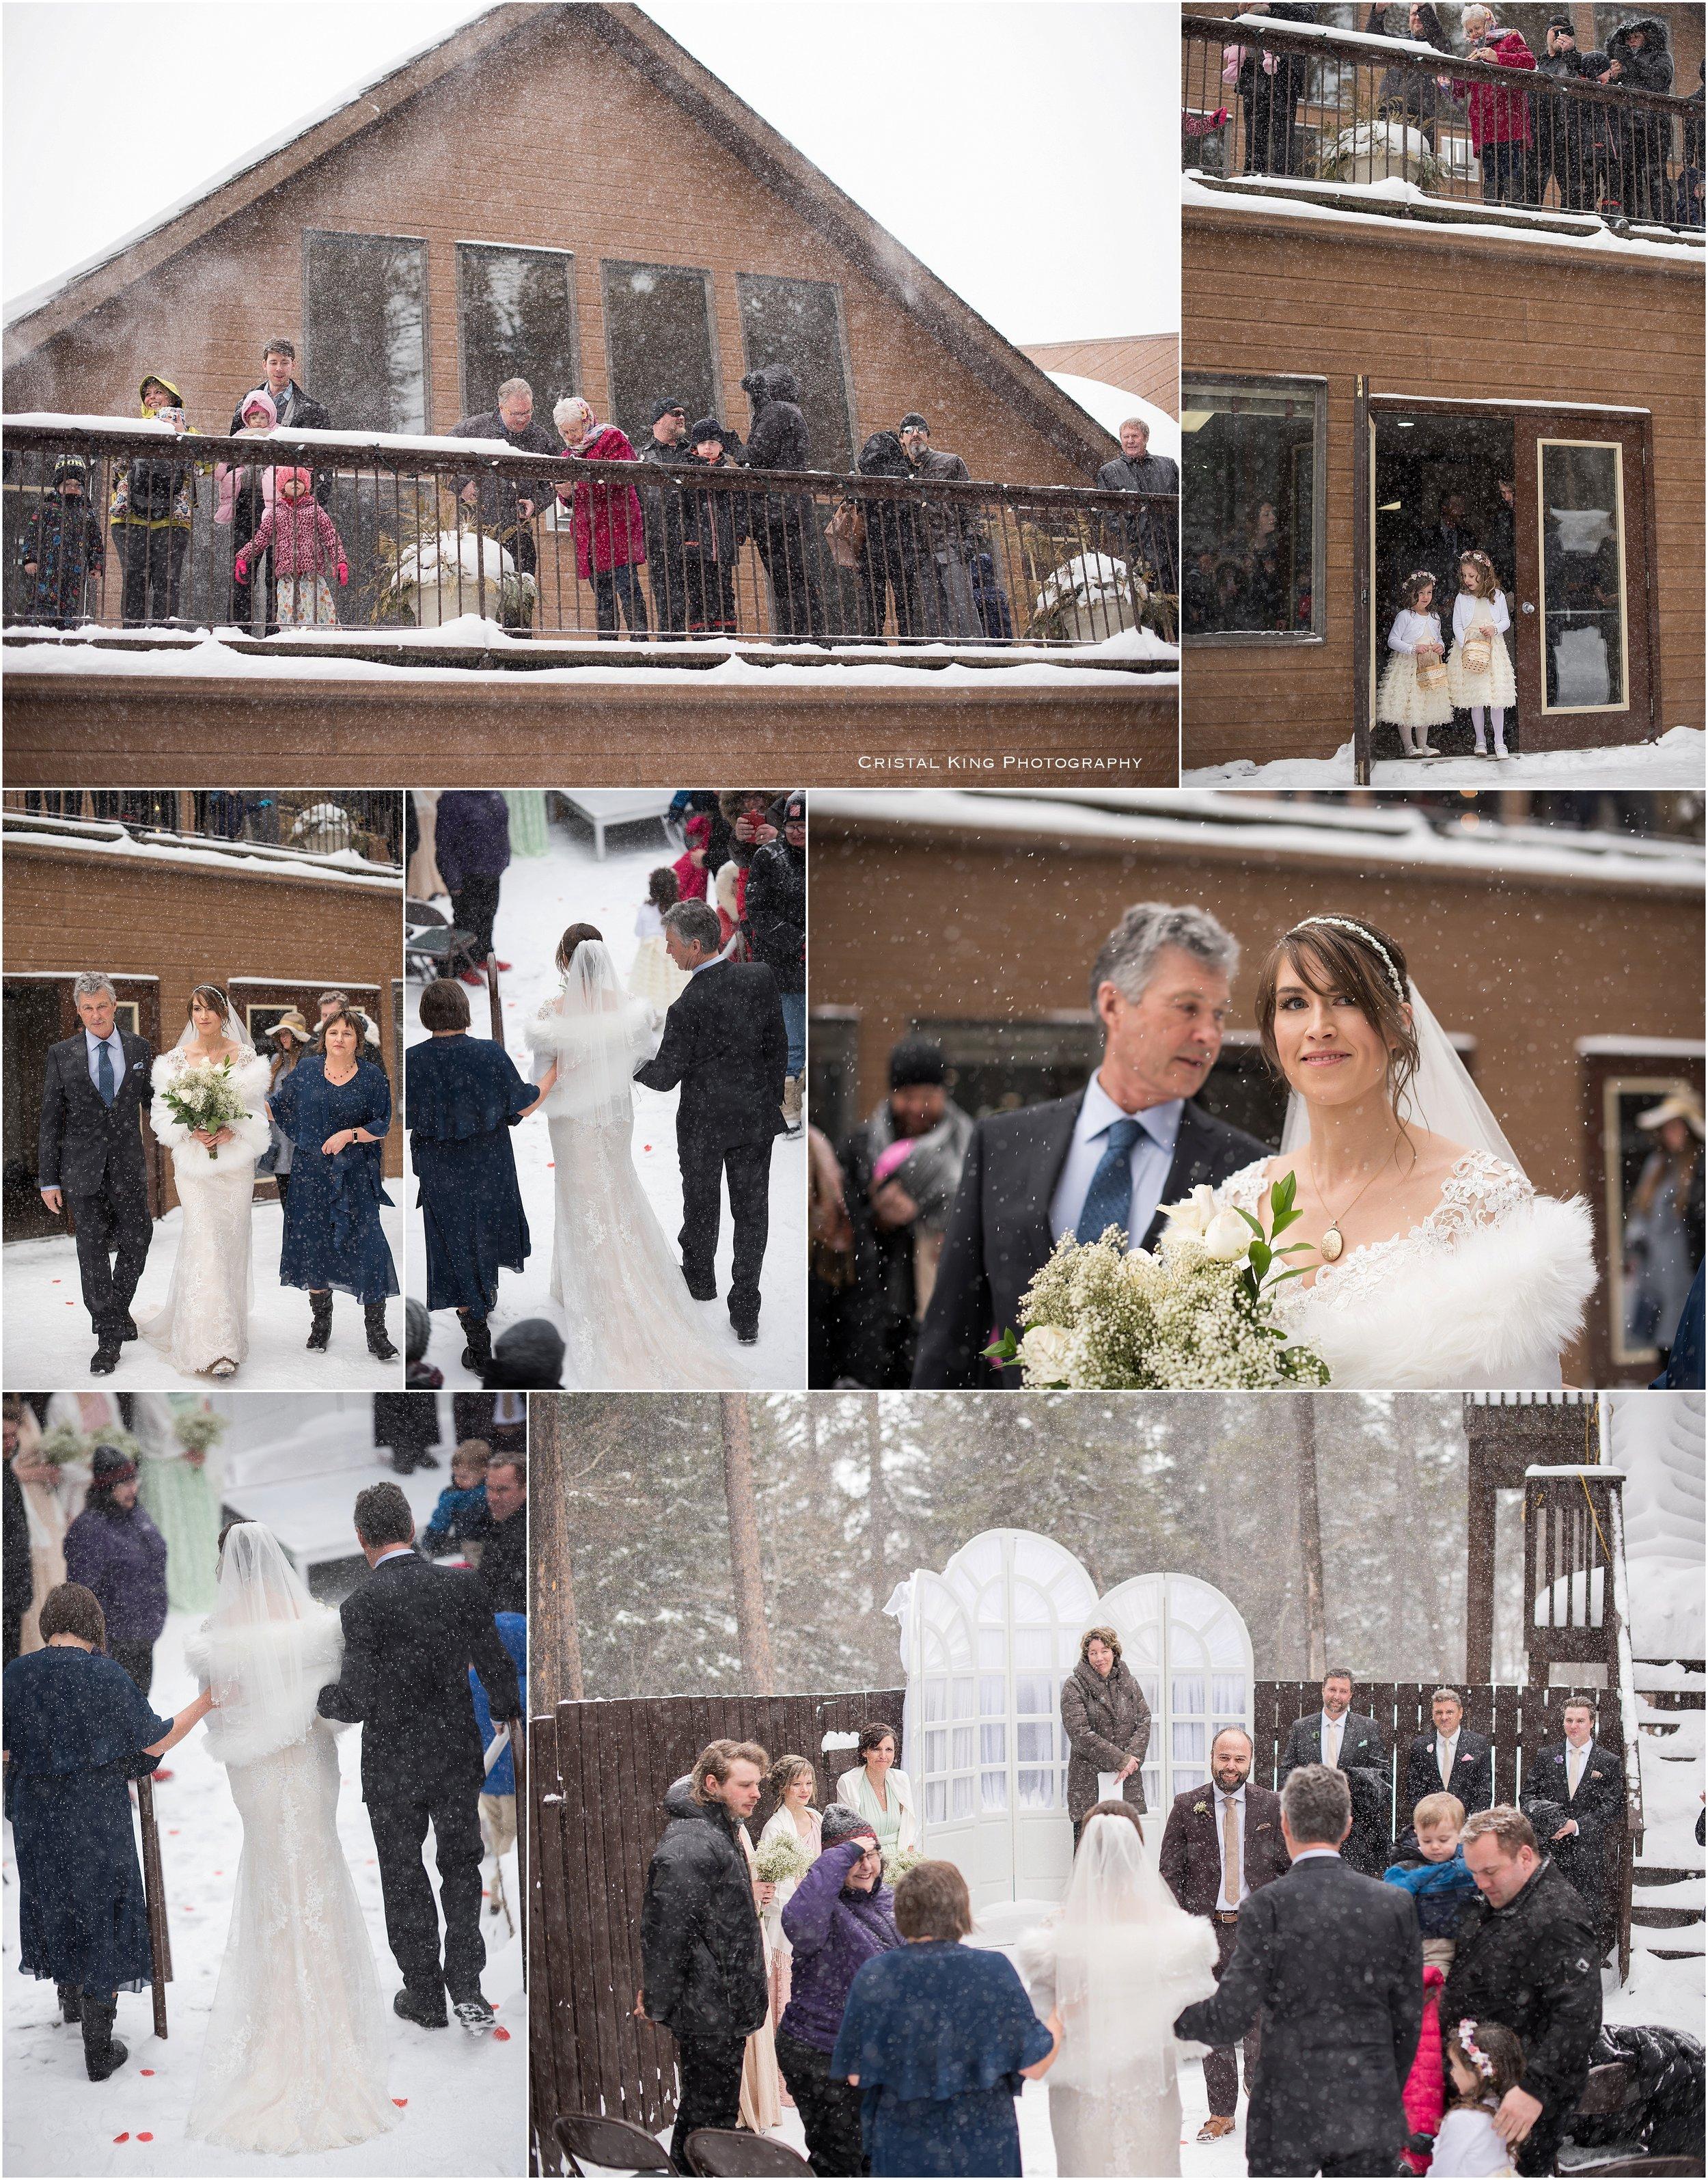 Jacqueline-Jasons-Wedding-1.jpg